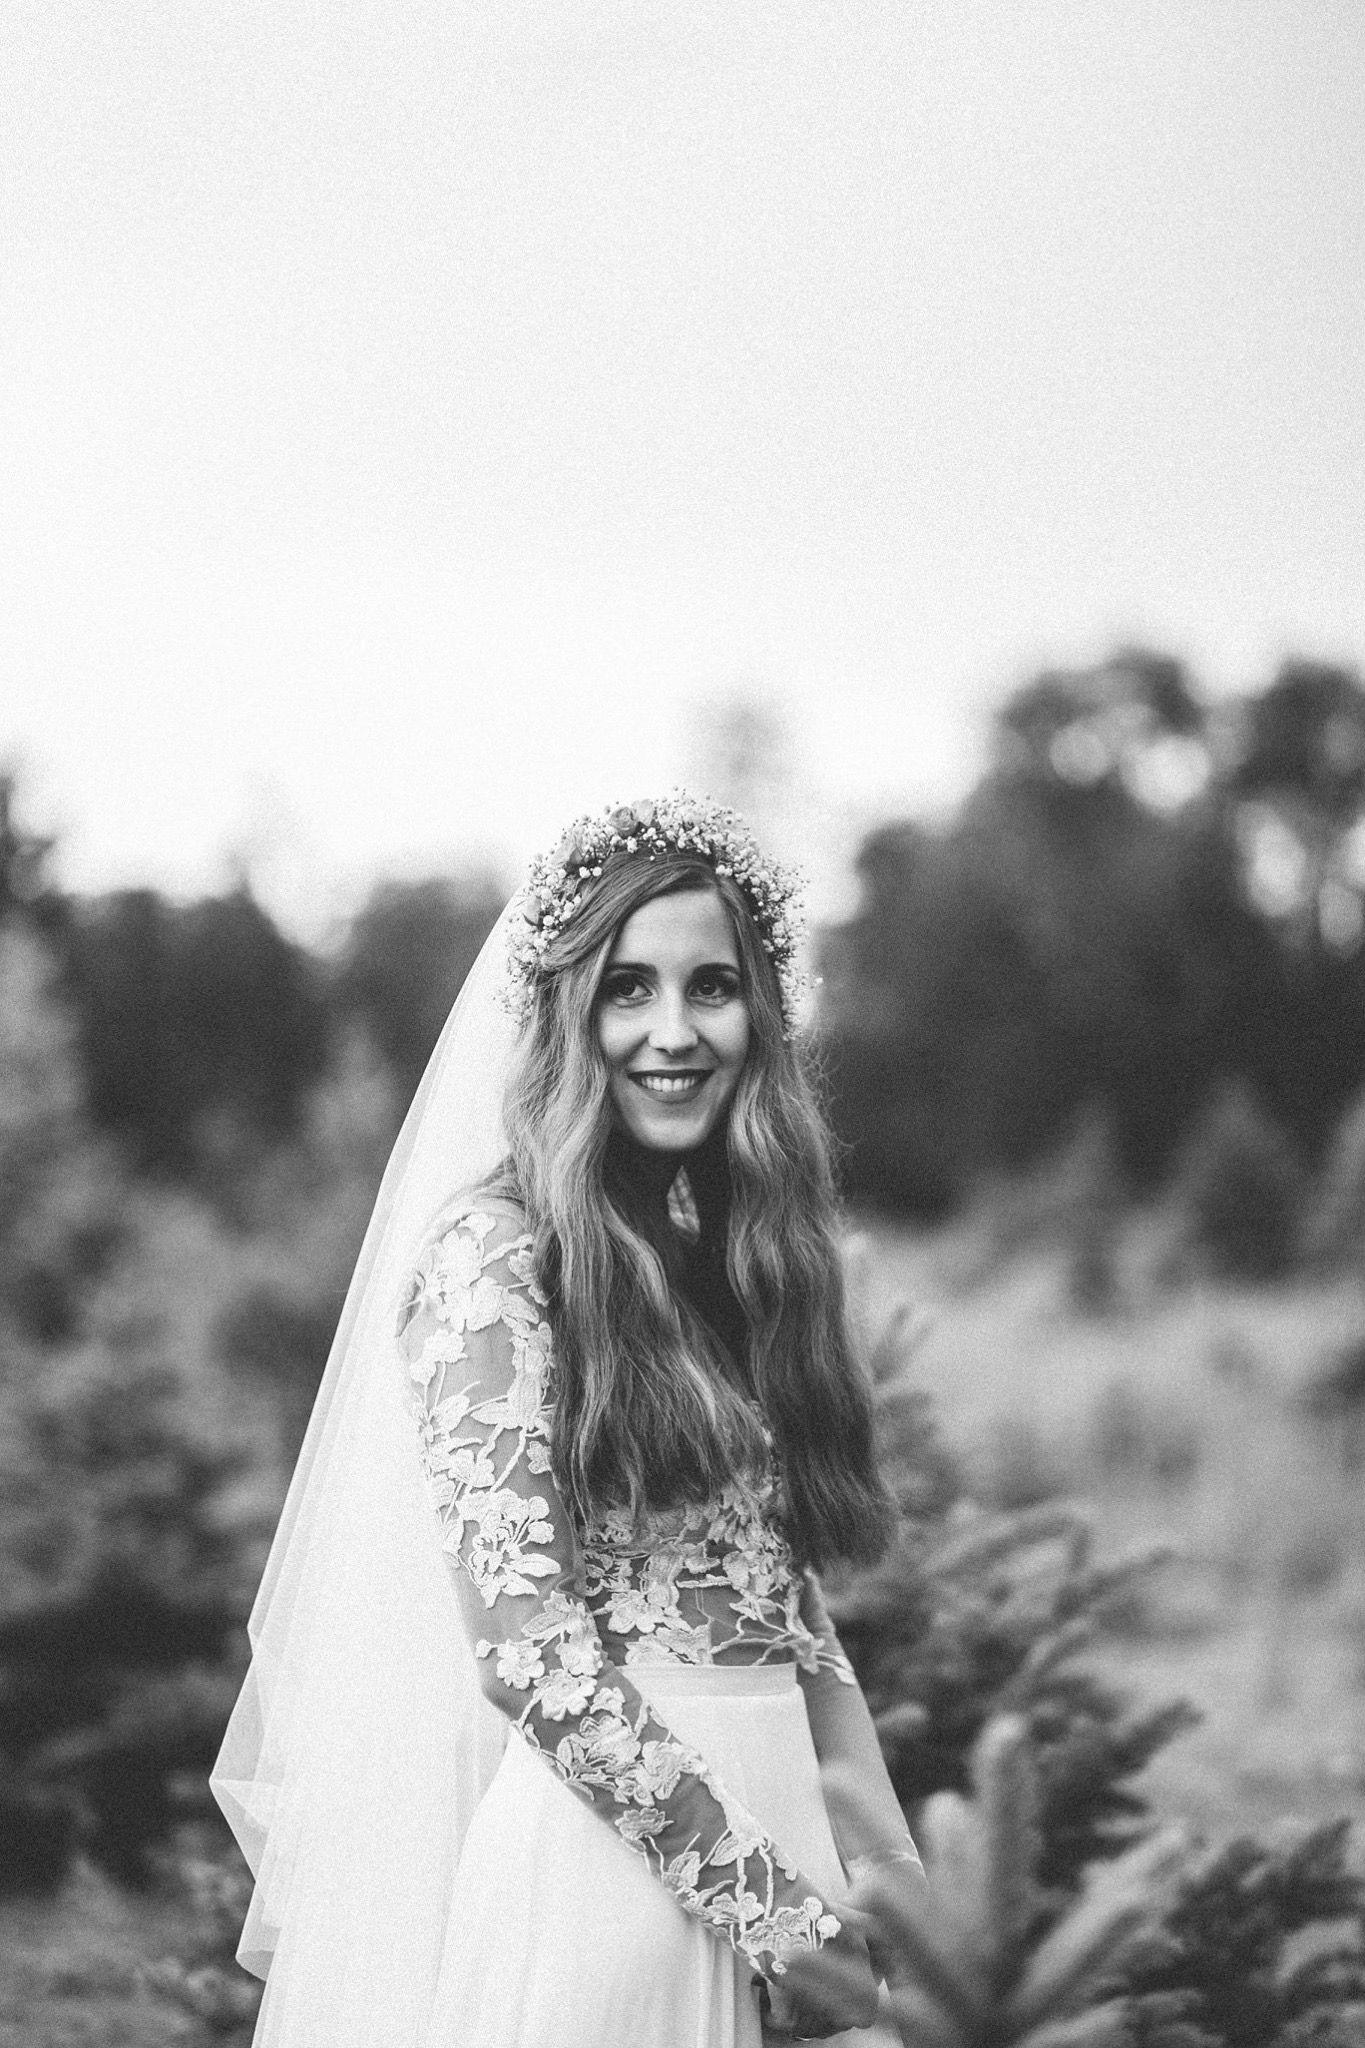 eskuvo-classic-balintsara-menyasszonyi-ruhatervezo-eskuvoi-ruha-eco-eskuvoi-ruha-215-10